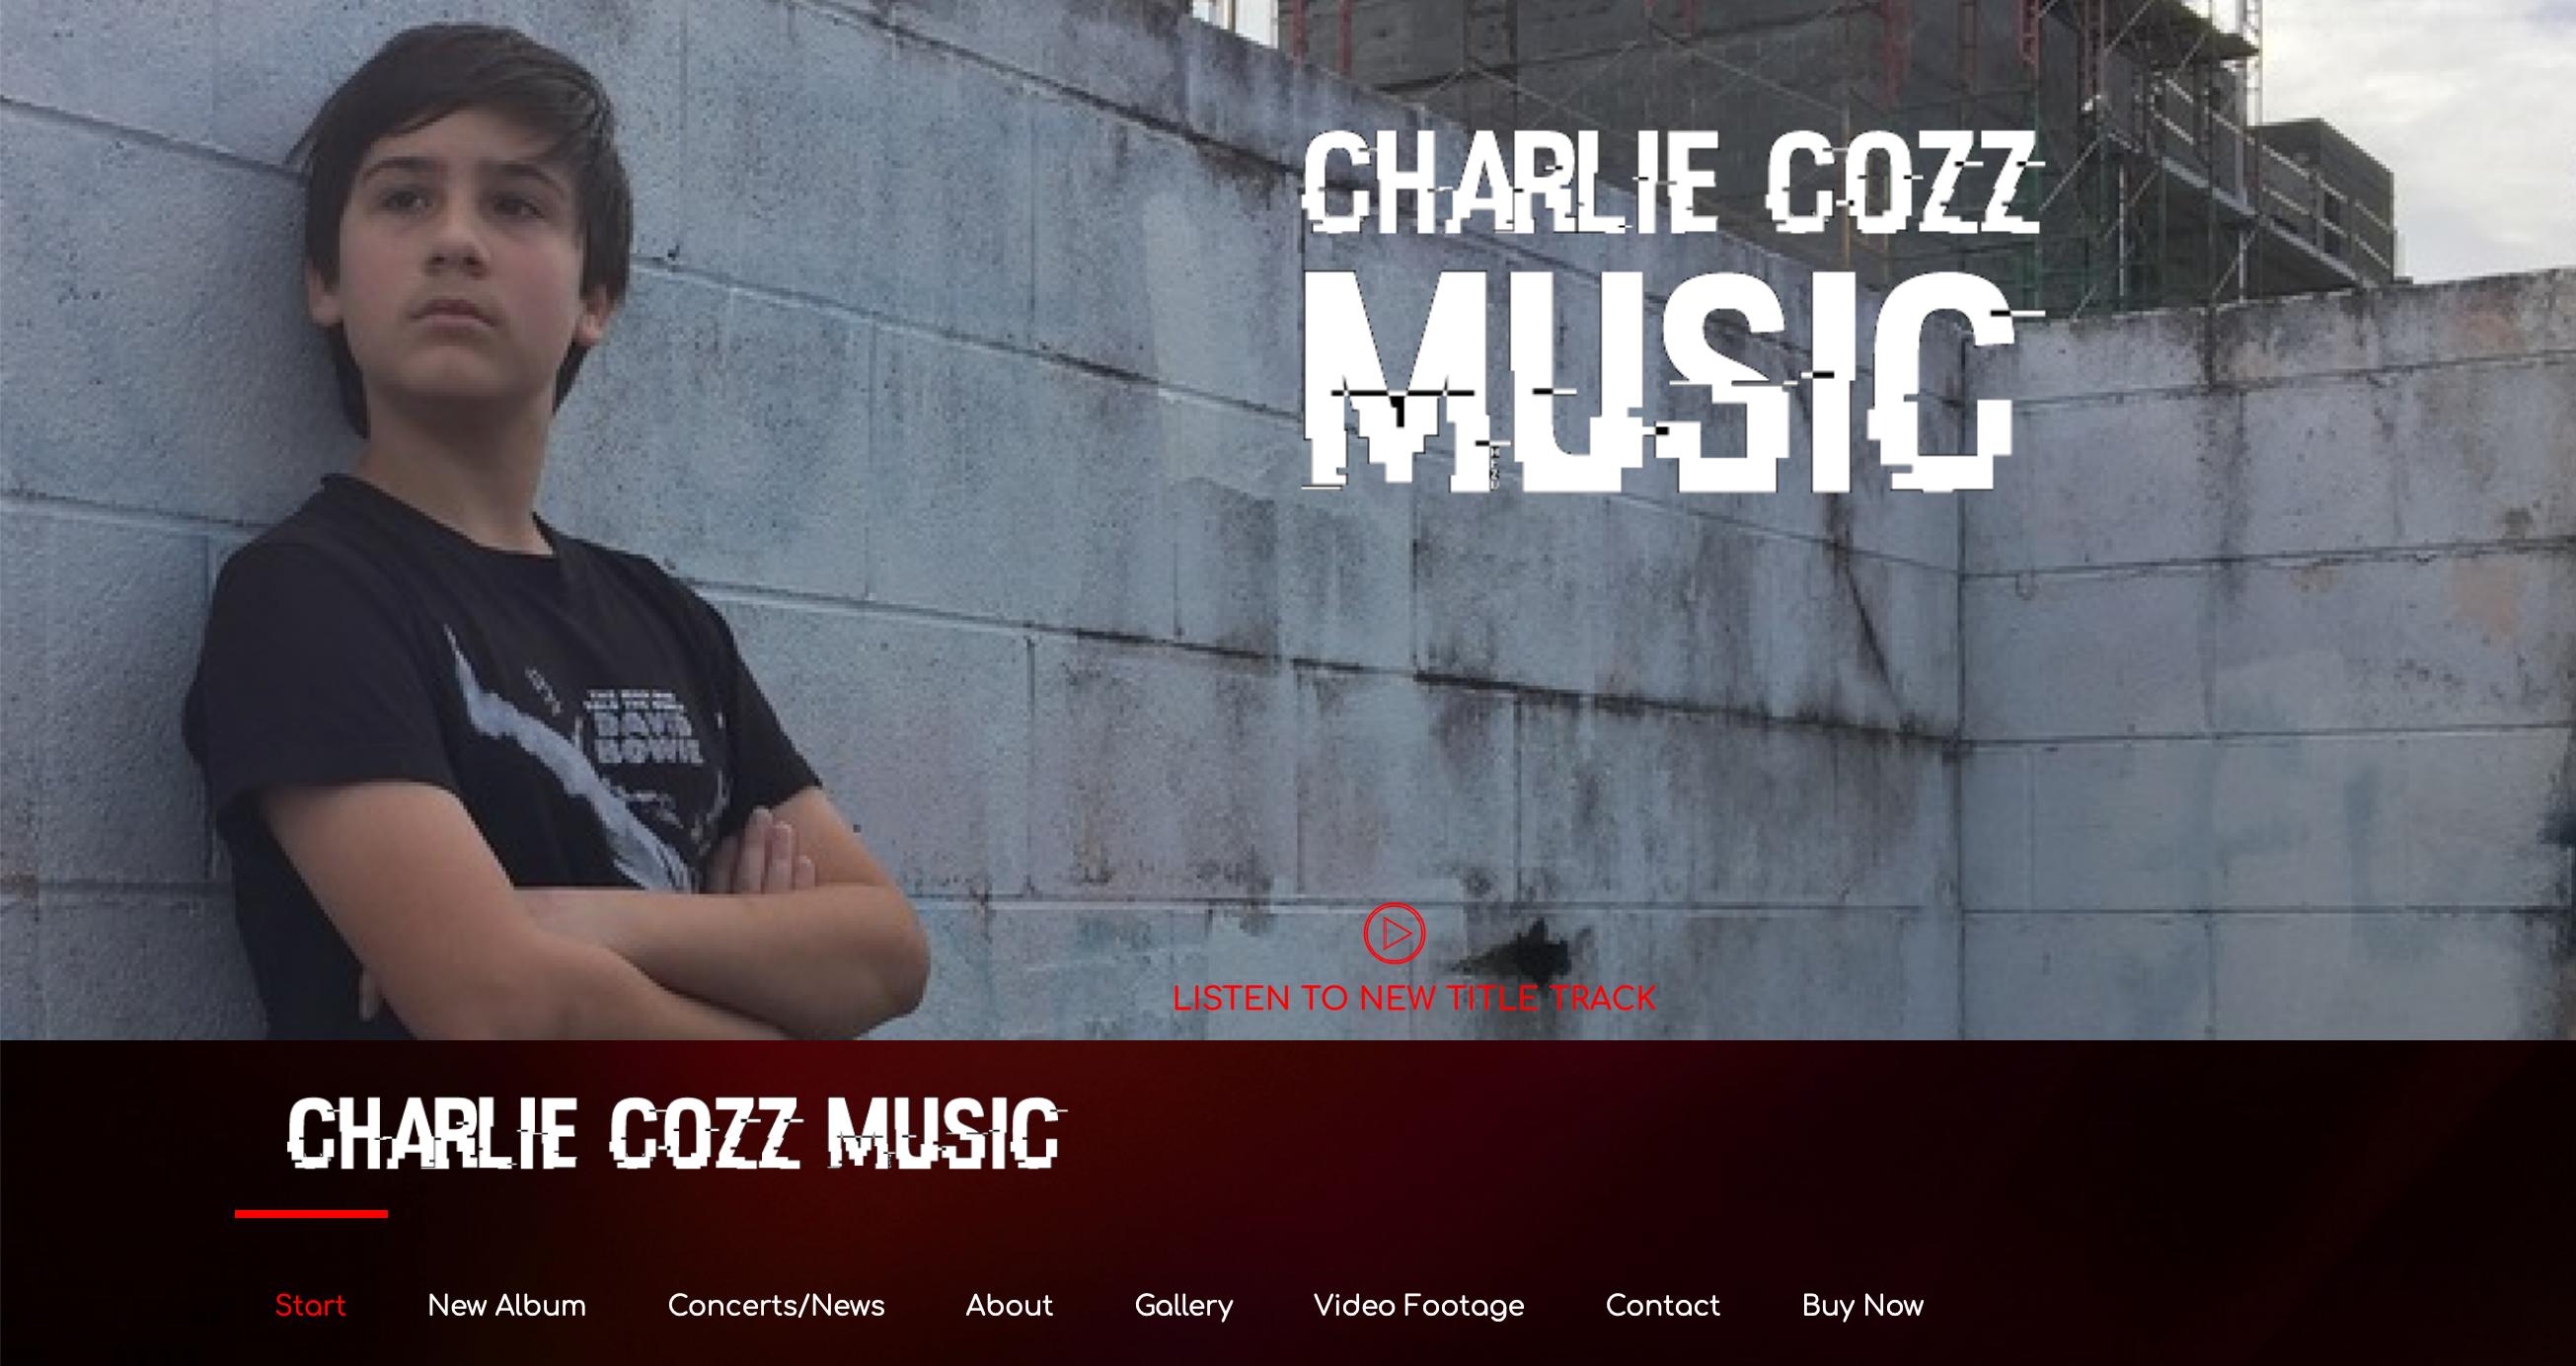 Charlie Cozz Music